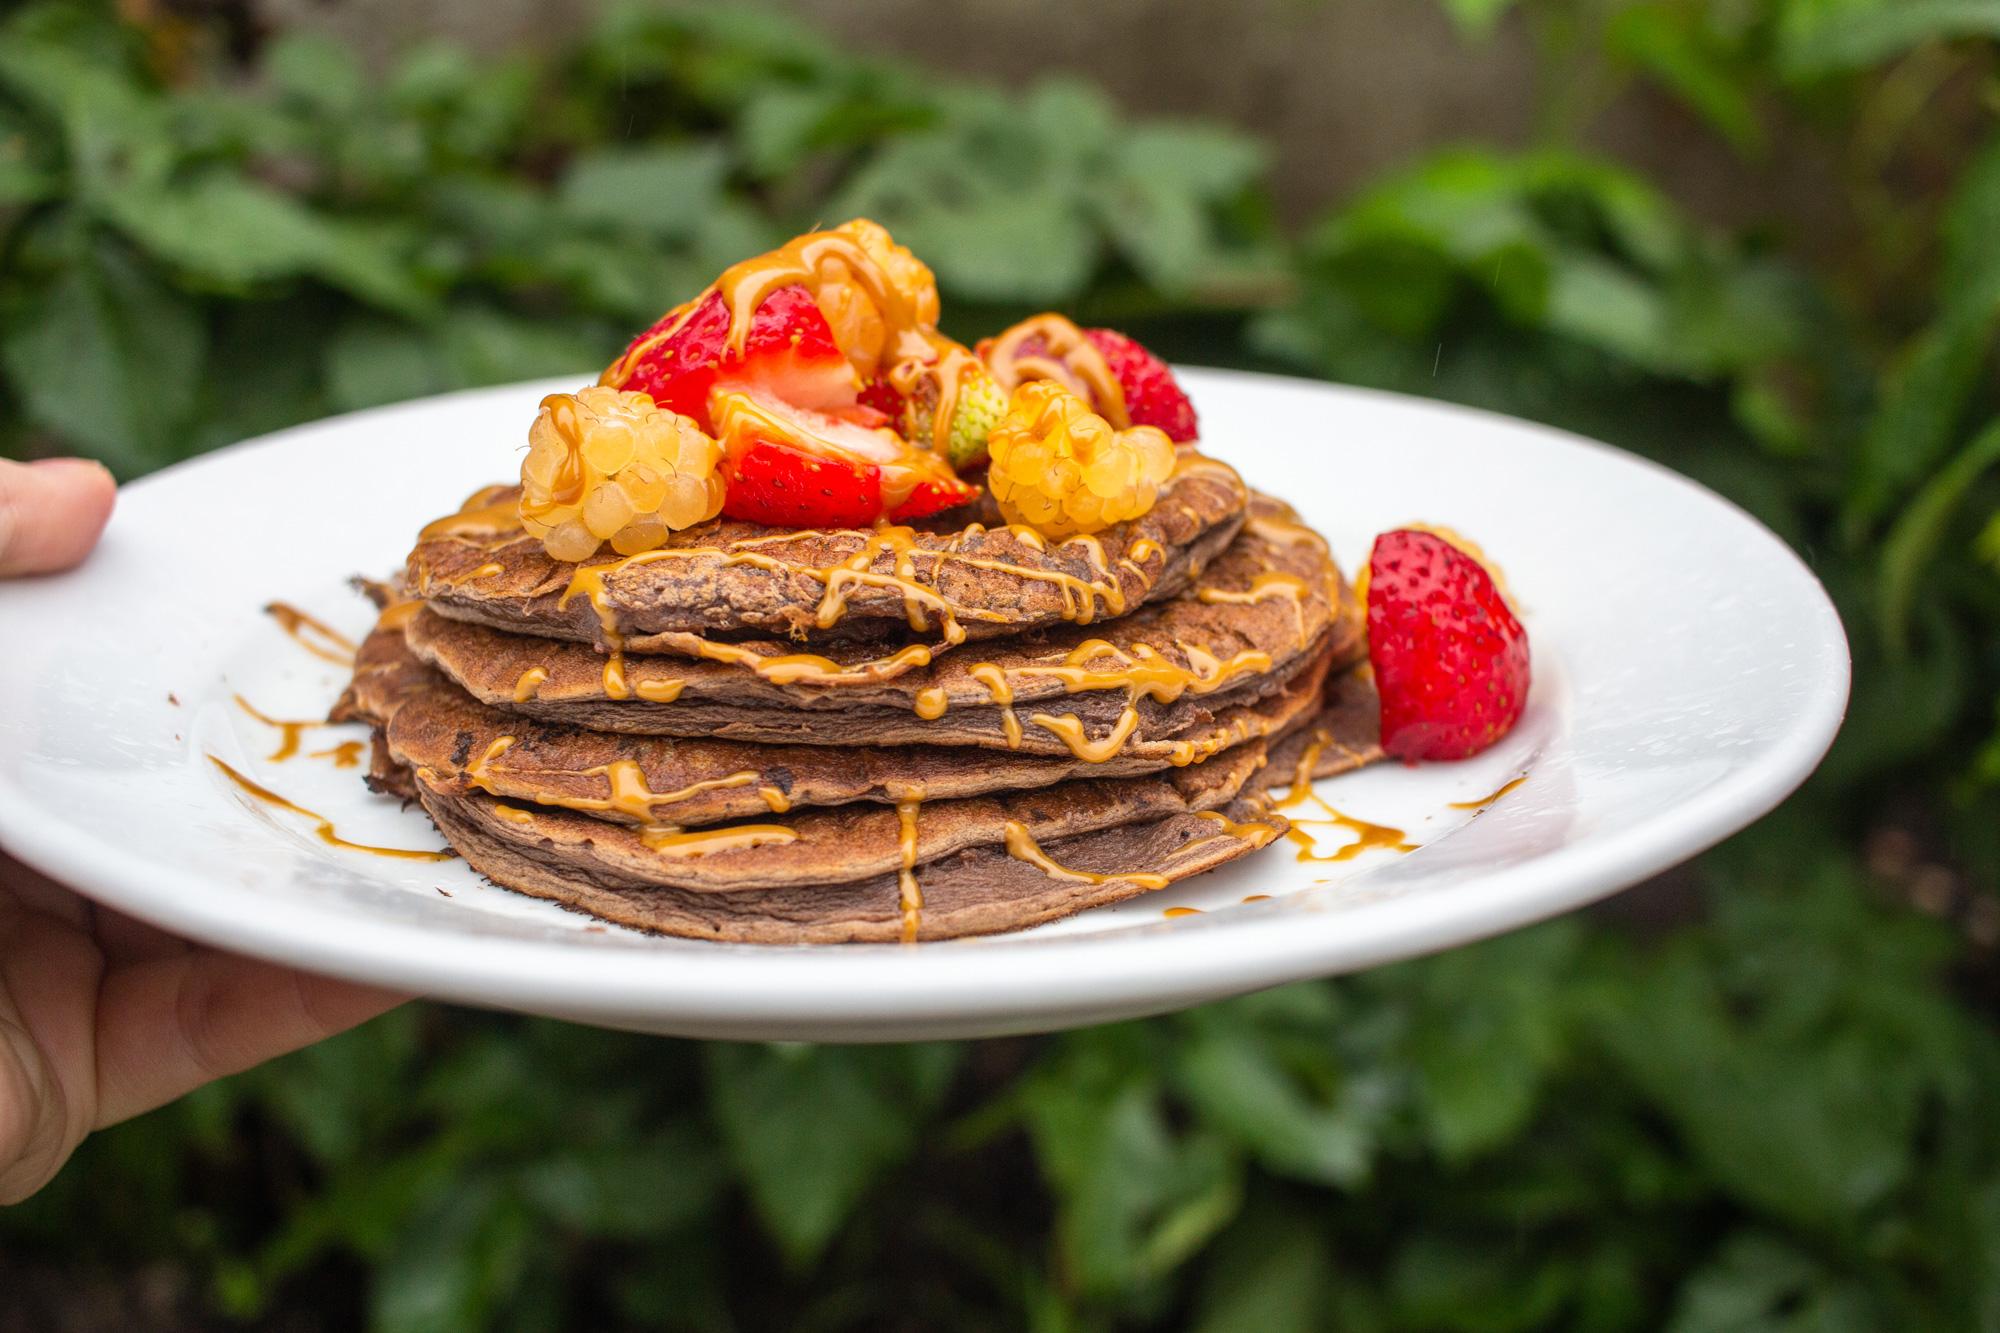 Pancakes made ith protein powder